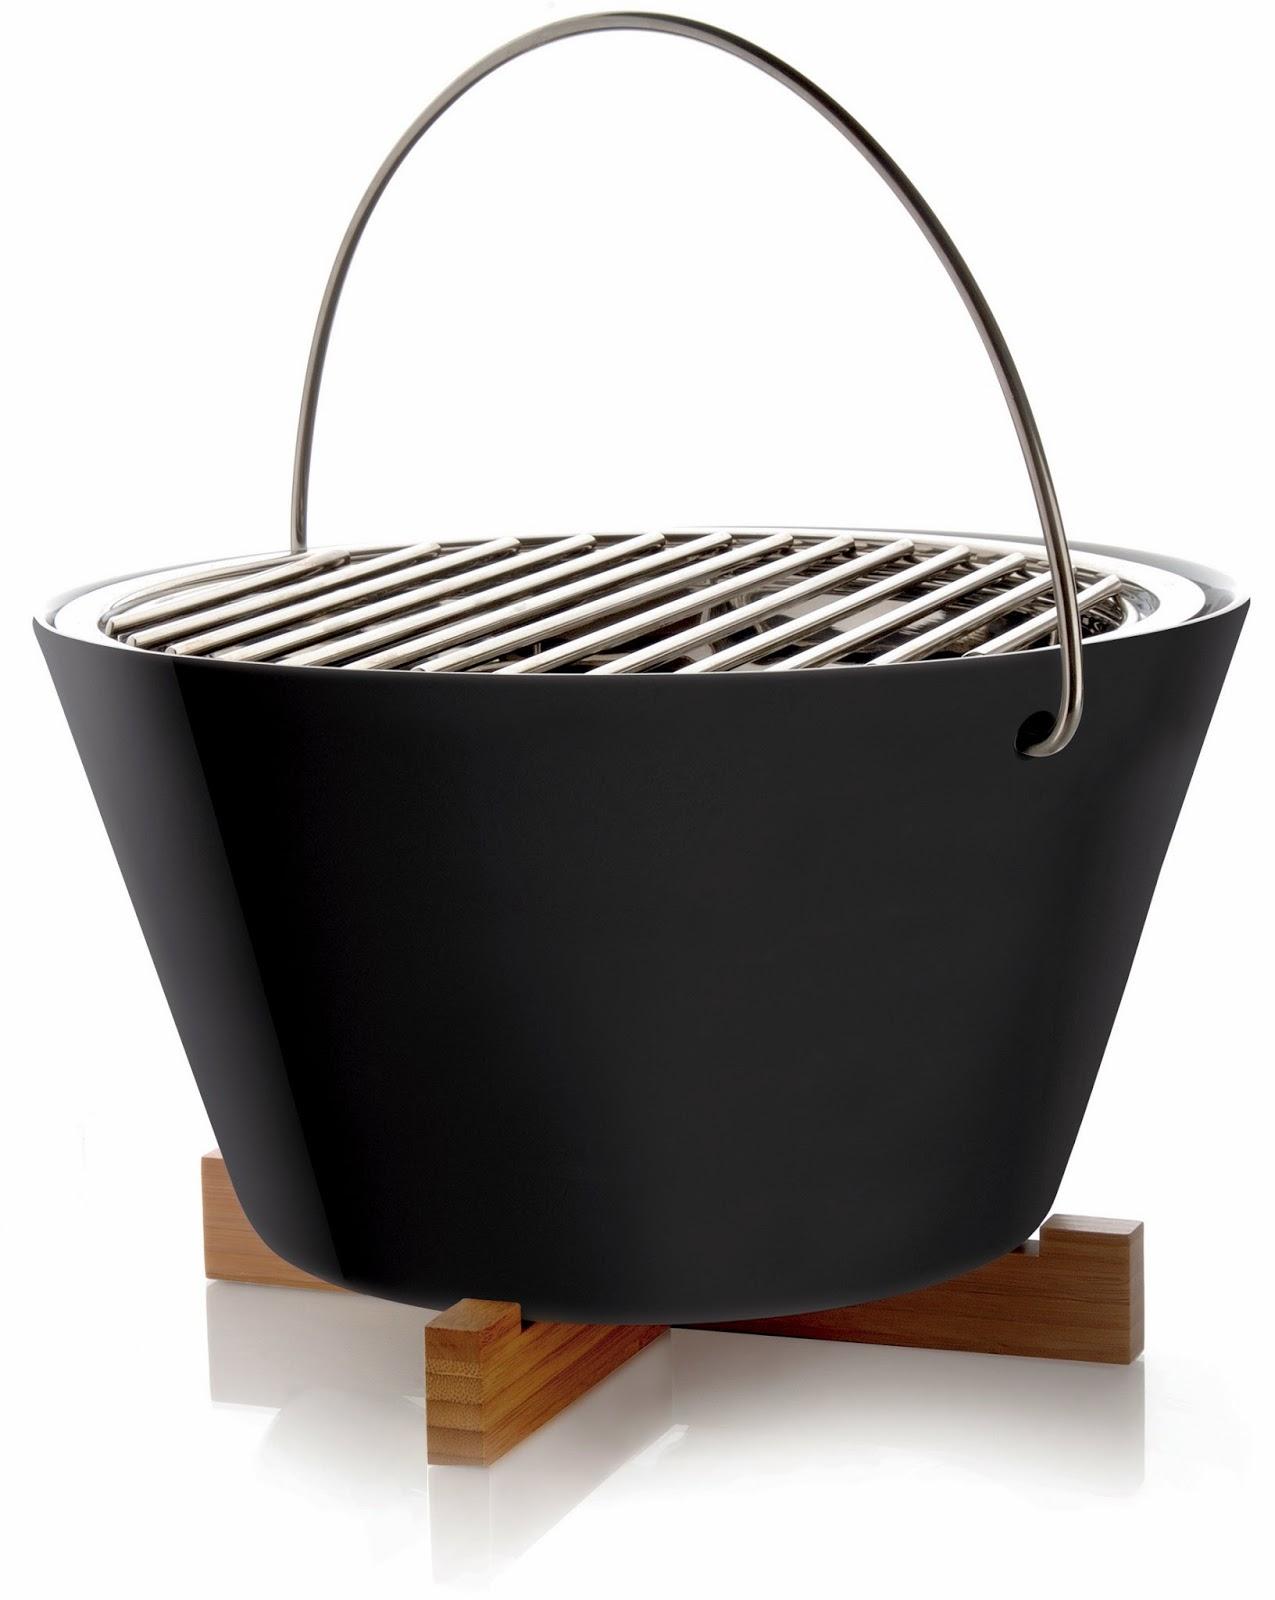 cocina sana cocina a la barbacoa. Black Bedroom Furniture Sets. Home Design Ideas